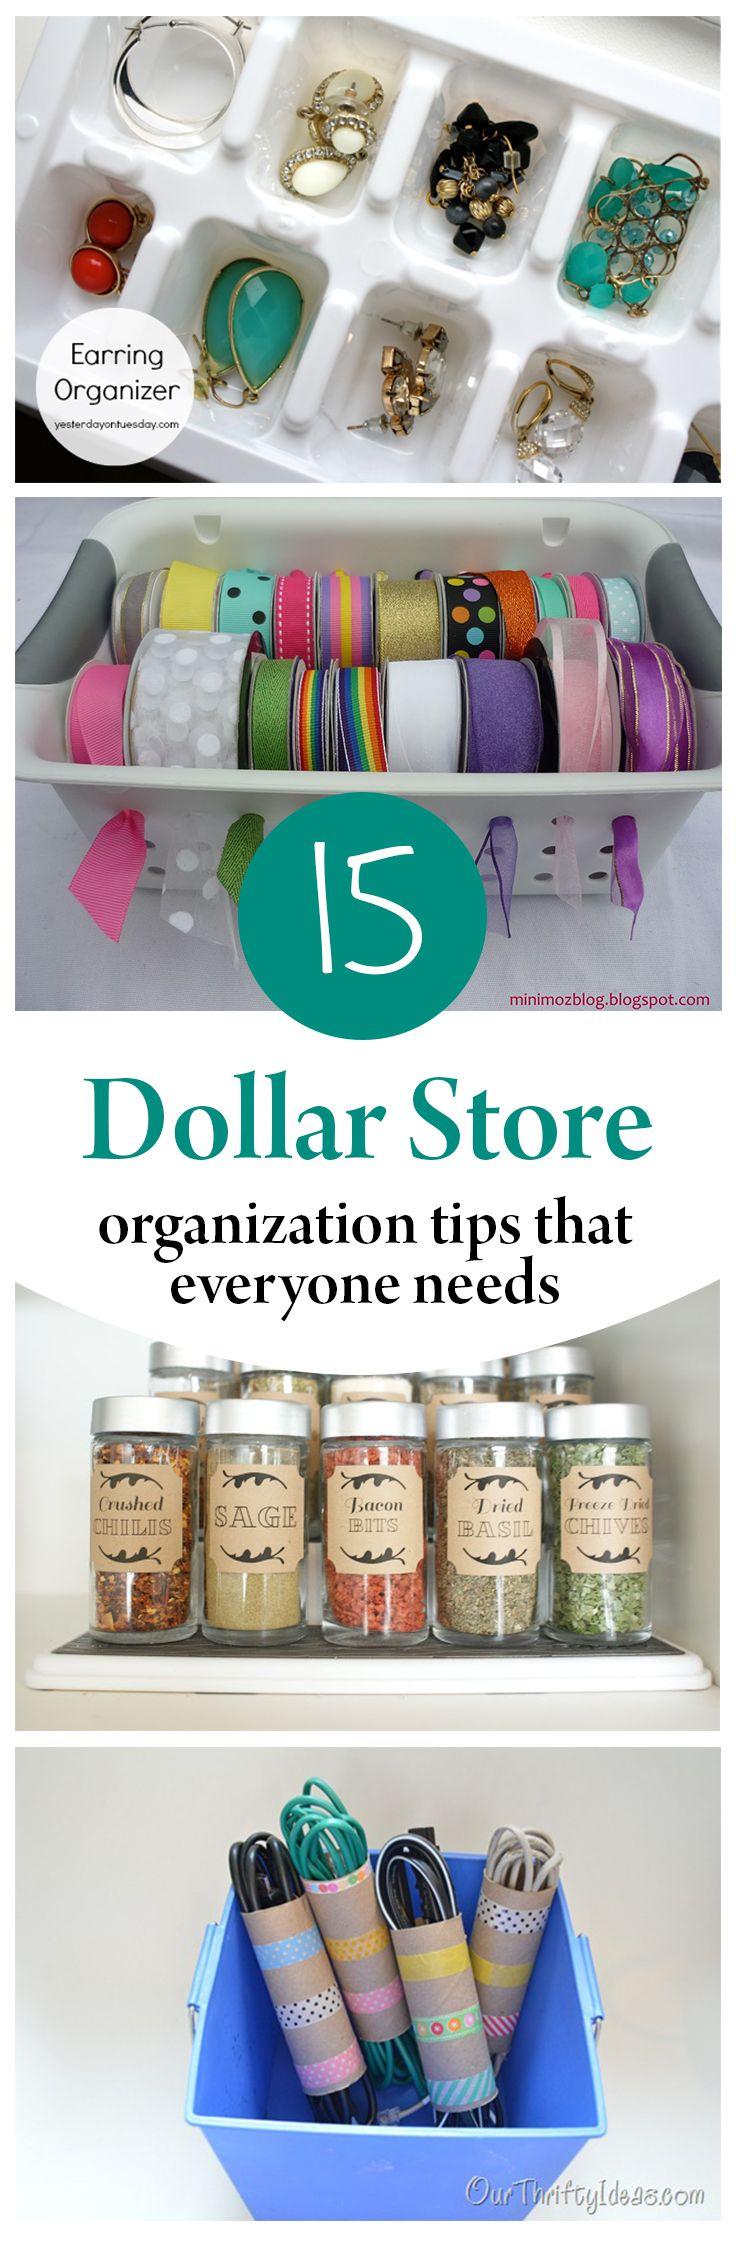 15 Dollar Store Organization Tips That Everyone Needs